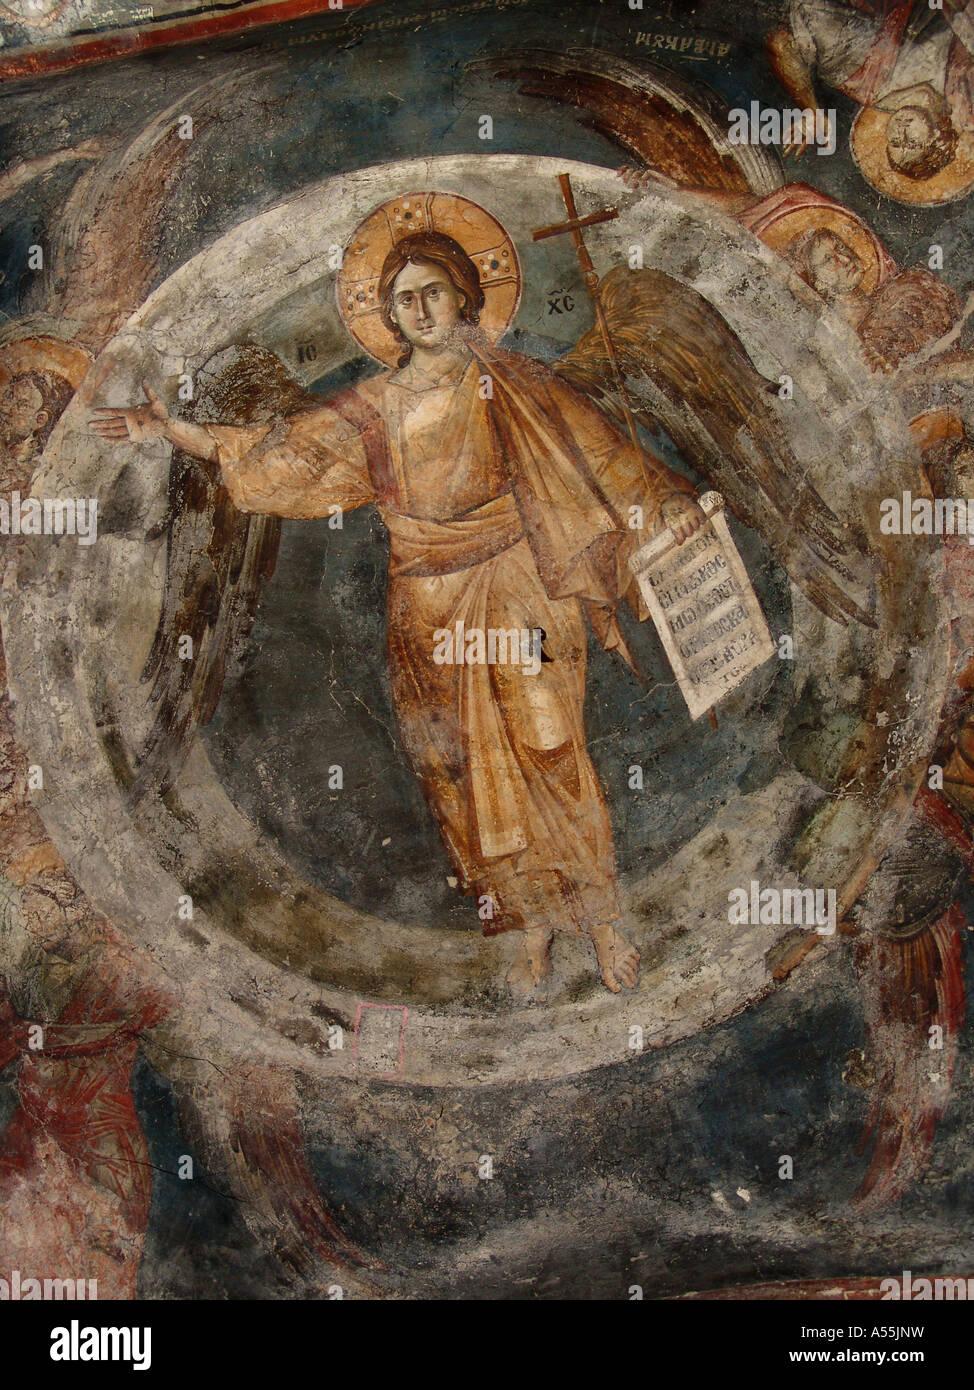 Painet is1296 macedonia yugoslav republic fyrm christ creator main dome 13th century frescoes inside orthodox church - Stock Image